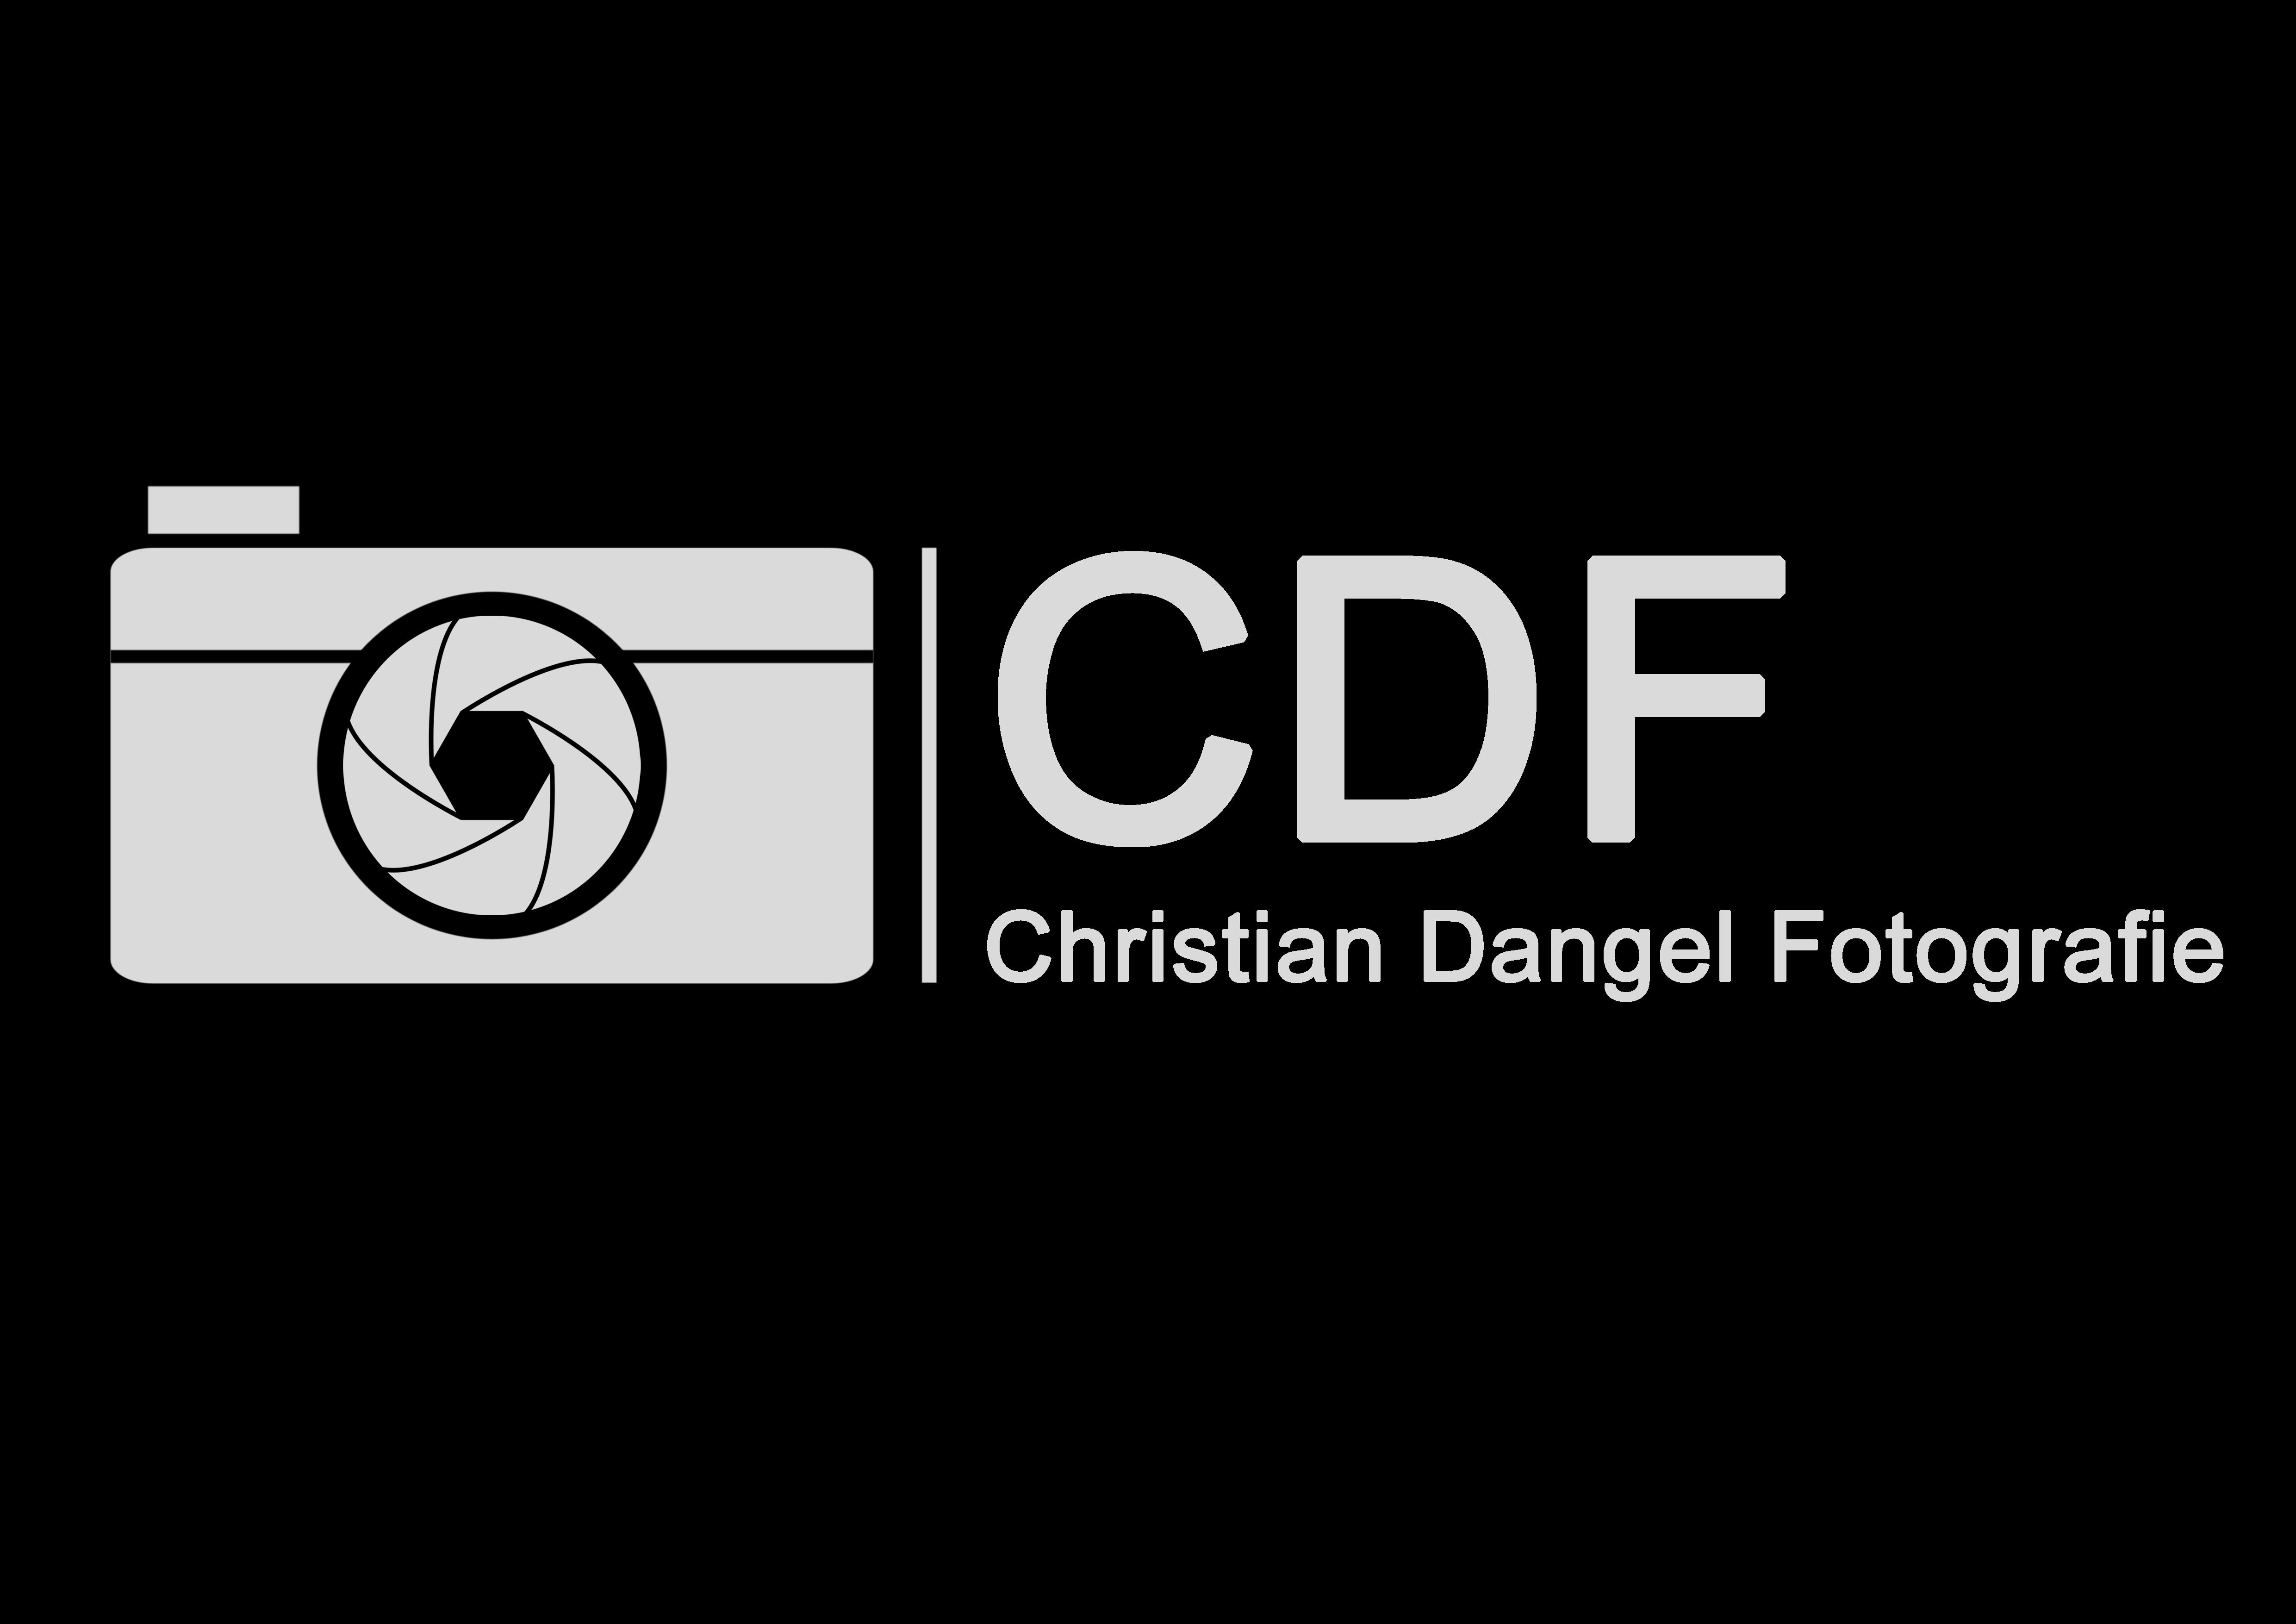 Christian Dangel Fotografie